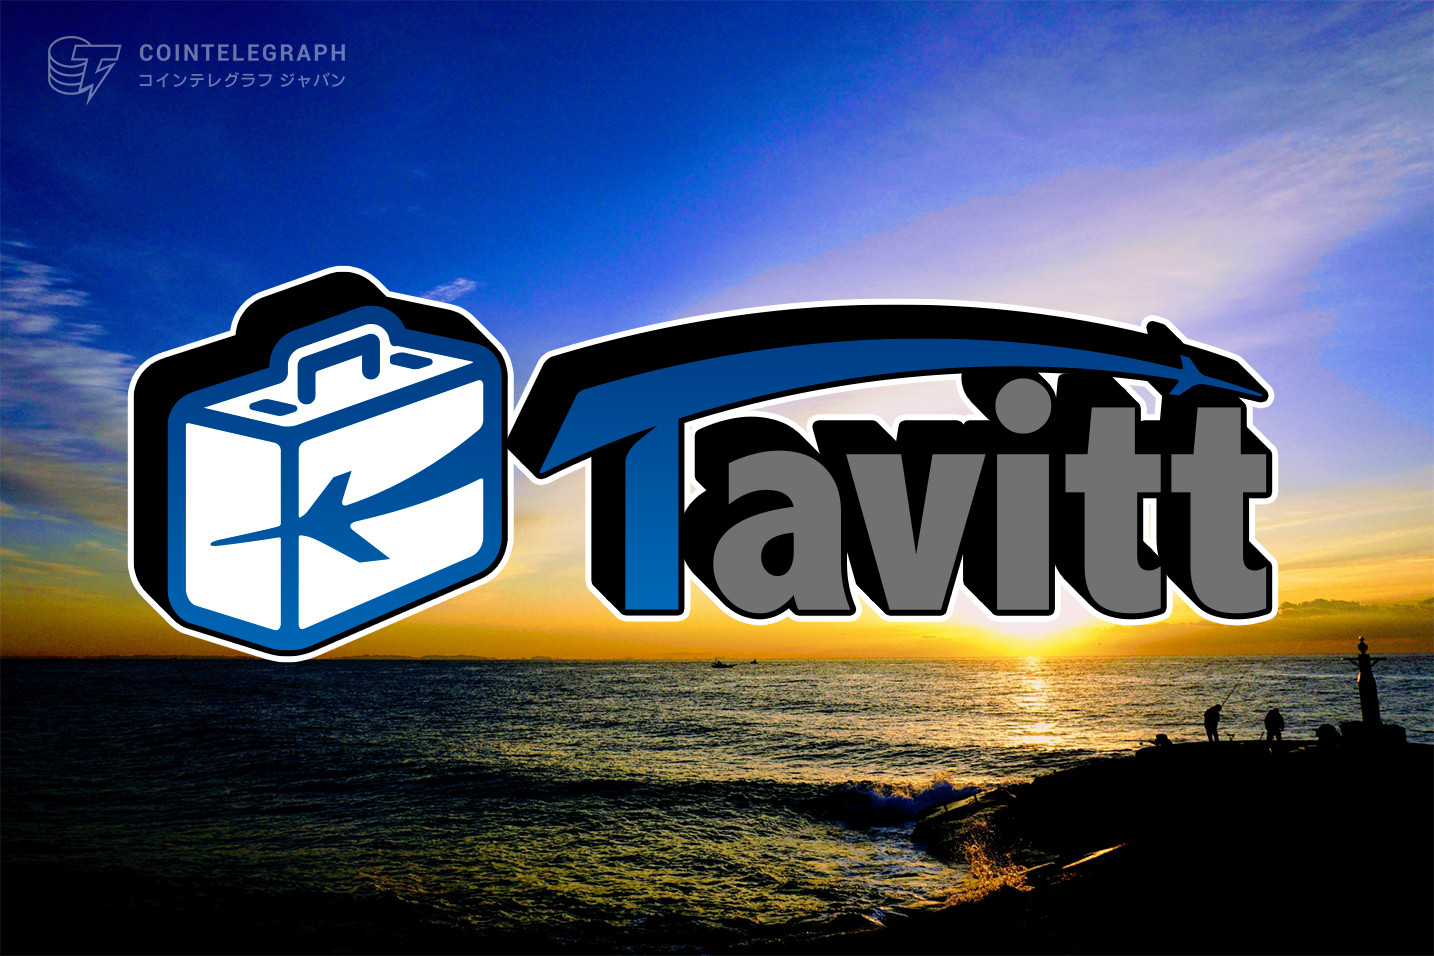 Tavitt/タビットファーミングできる分散型取引所(DEX-)Tavitt swap(タビットスワップ)をローンチ